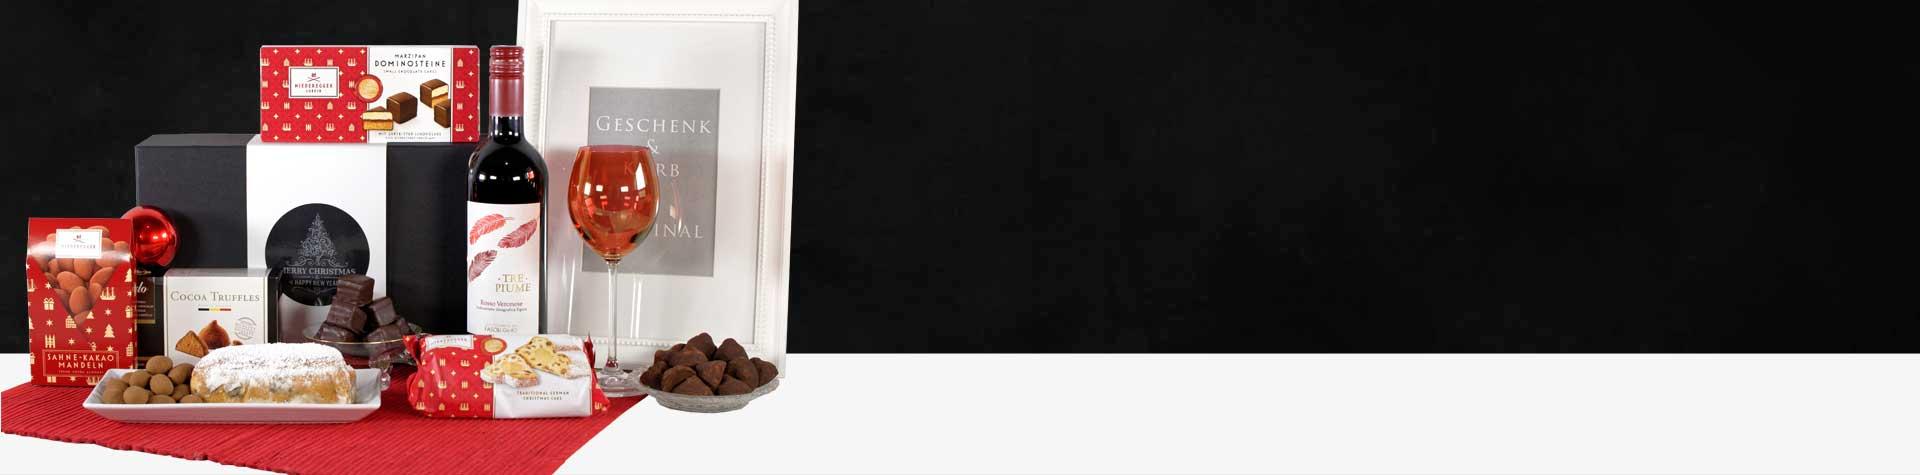 pr sentk rbe jetzt st bern online kaufen bestellen in 5 minuten. Black Bedroom Furniture Sets. Home Design Ideas